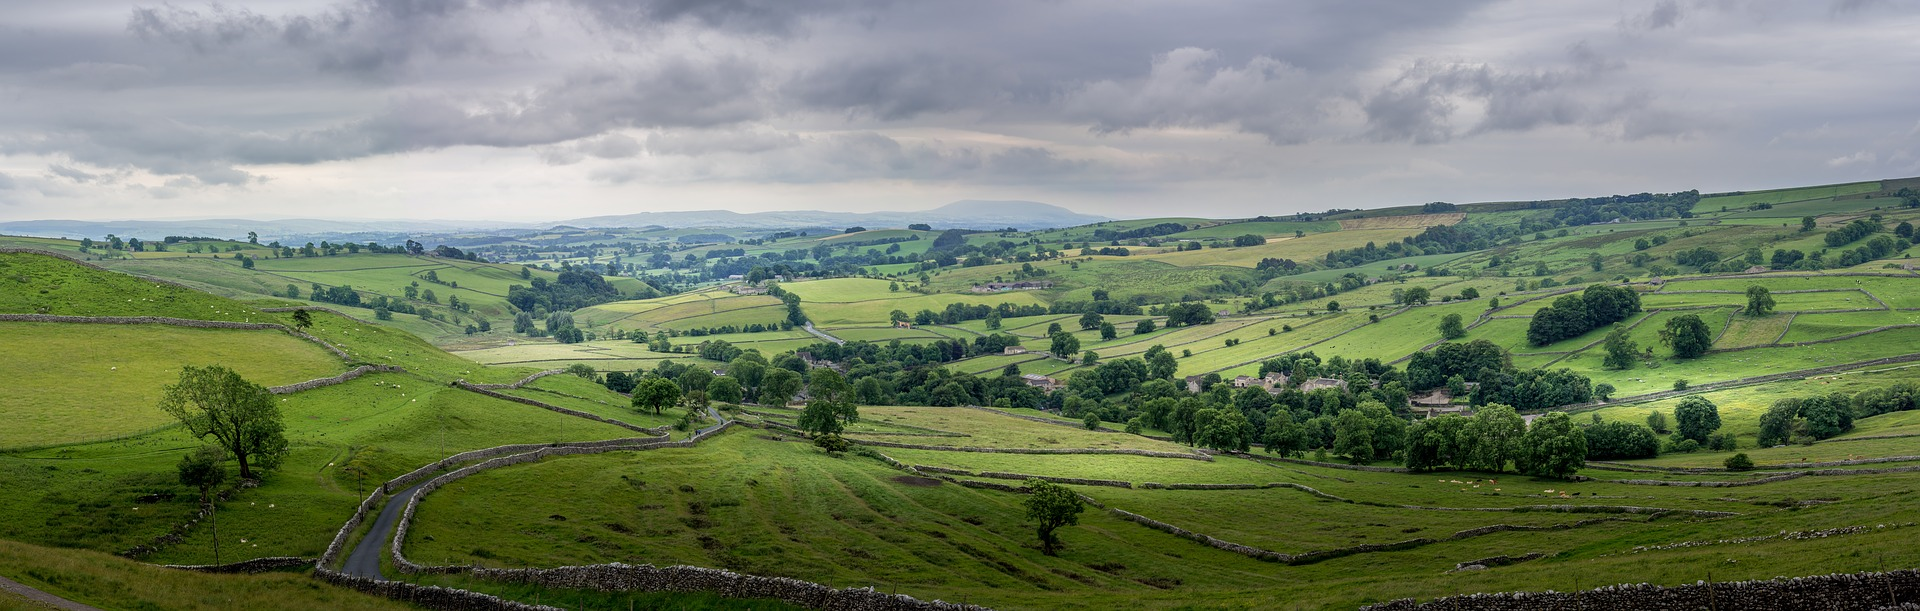 Malham in Yorkshire by Tim Hill